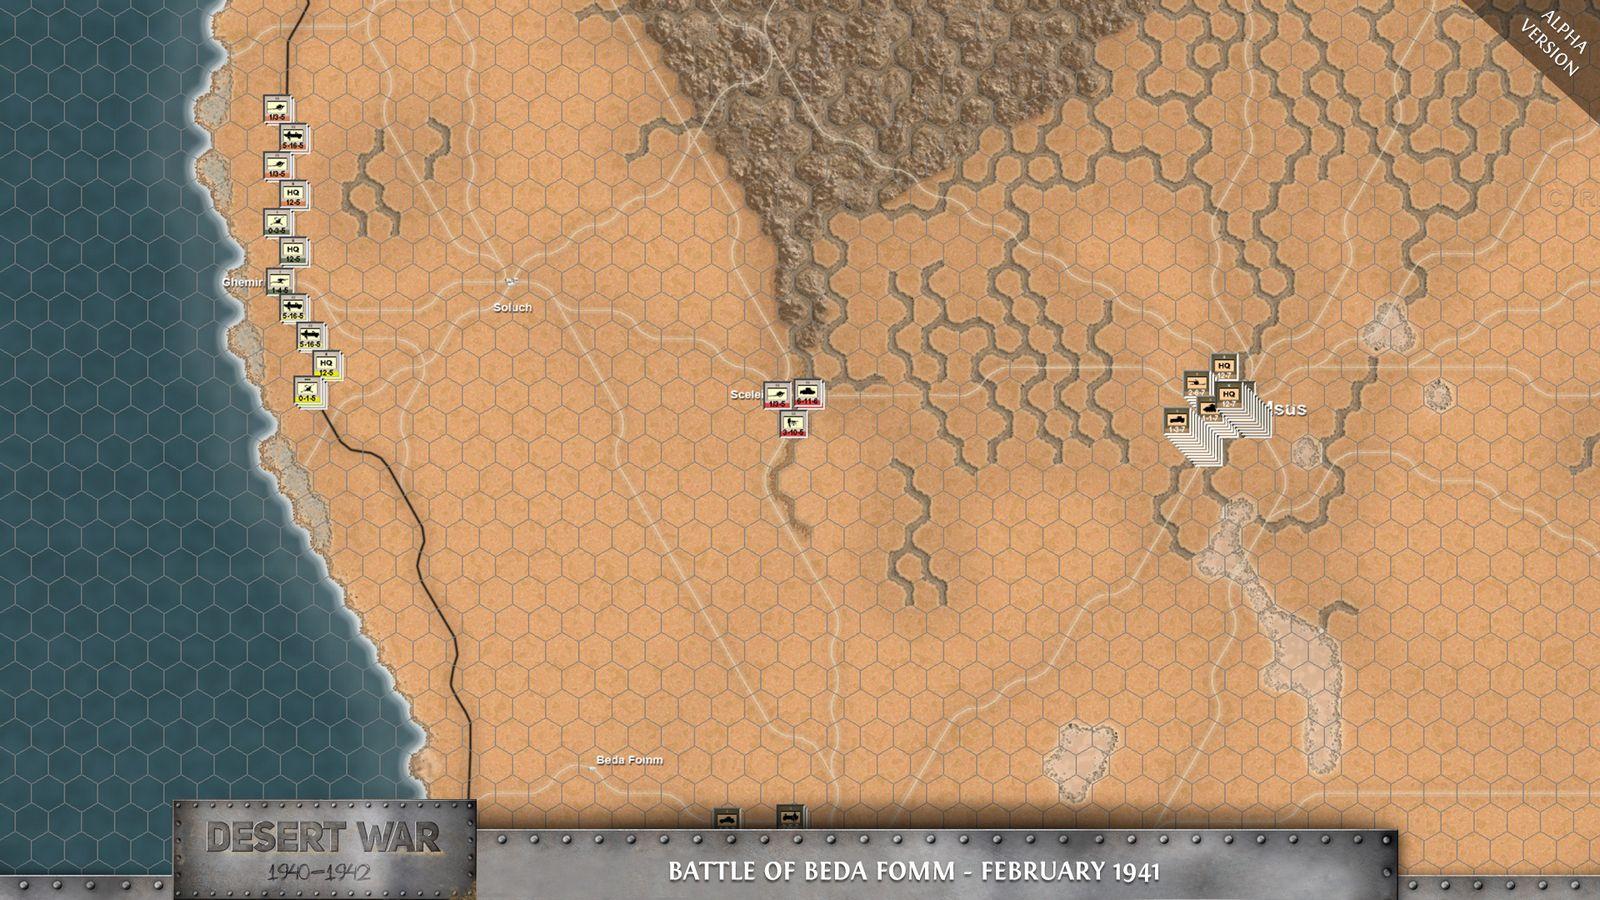 desert-war-40-42-0717-4-Battle_of_Beda_Fomm_February_1941